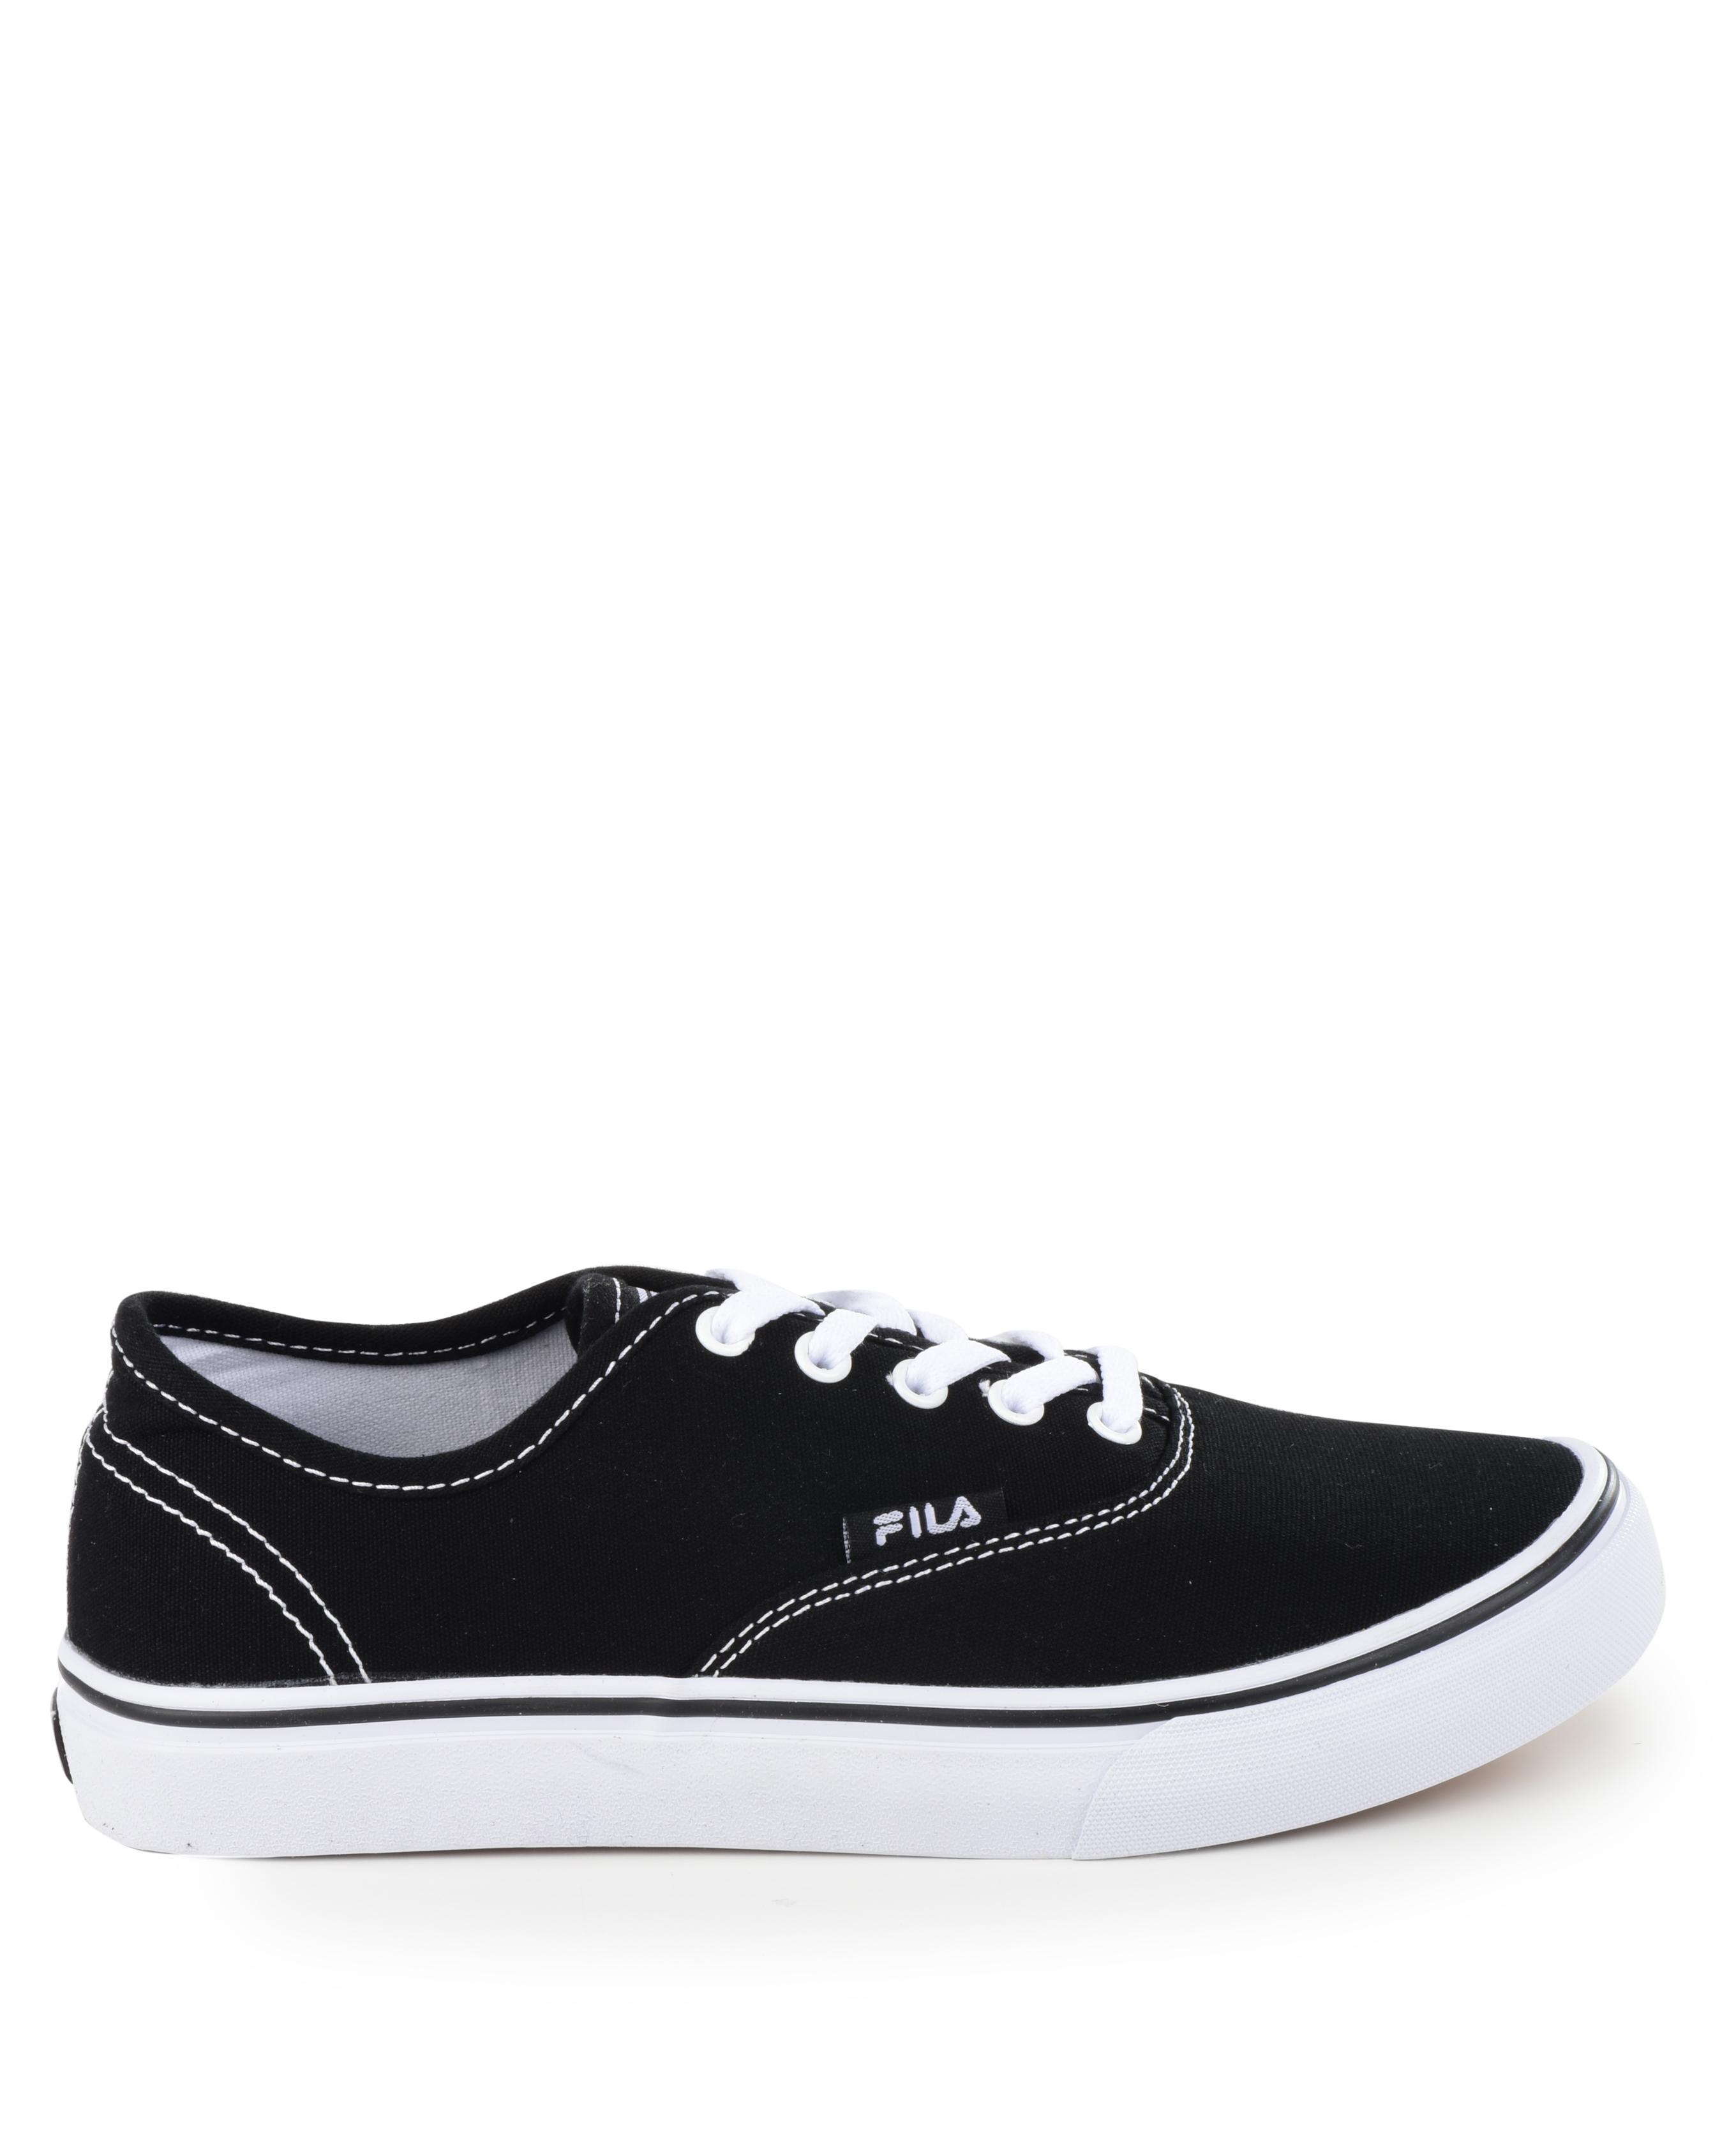 faaa7dcbf31c NEW Fila Women s Classic Canvas Shoe Sneakers Low Cut